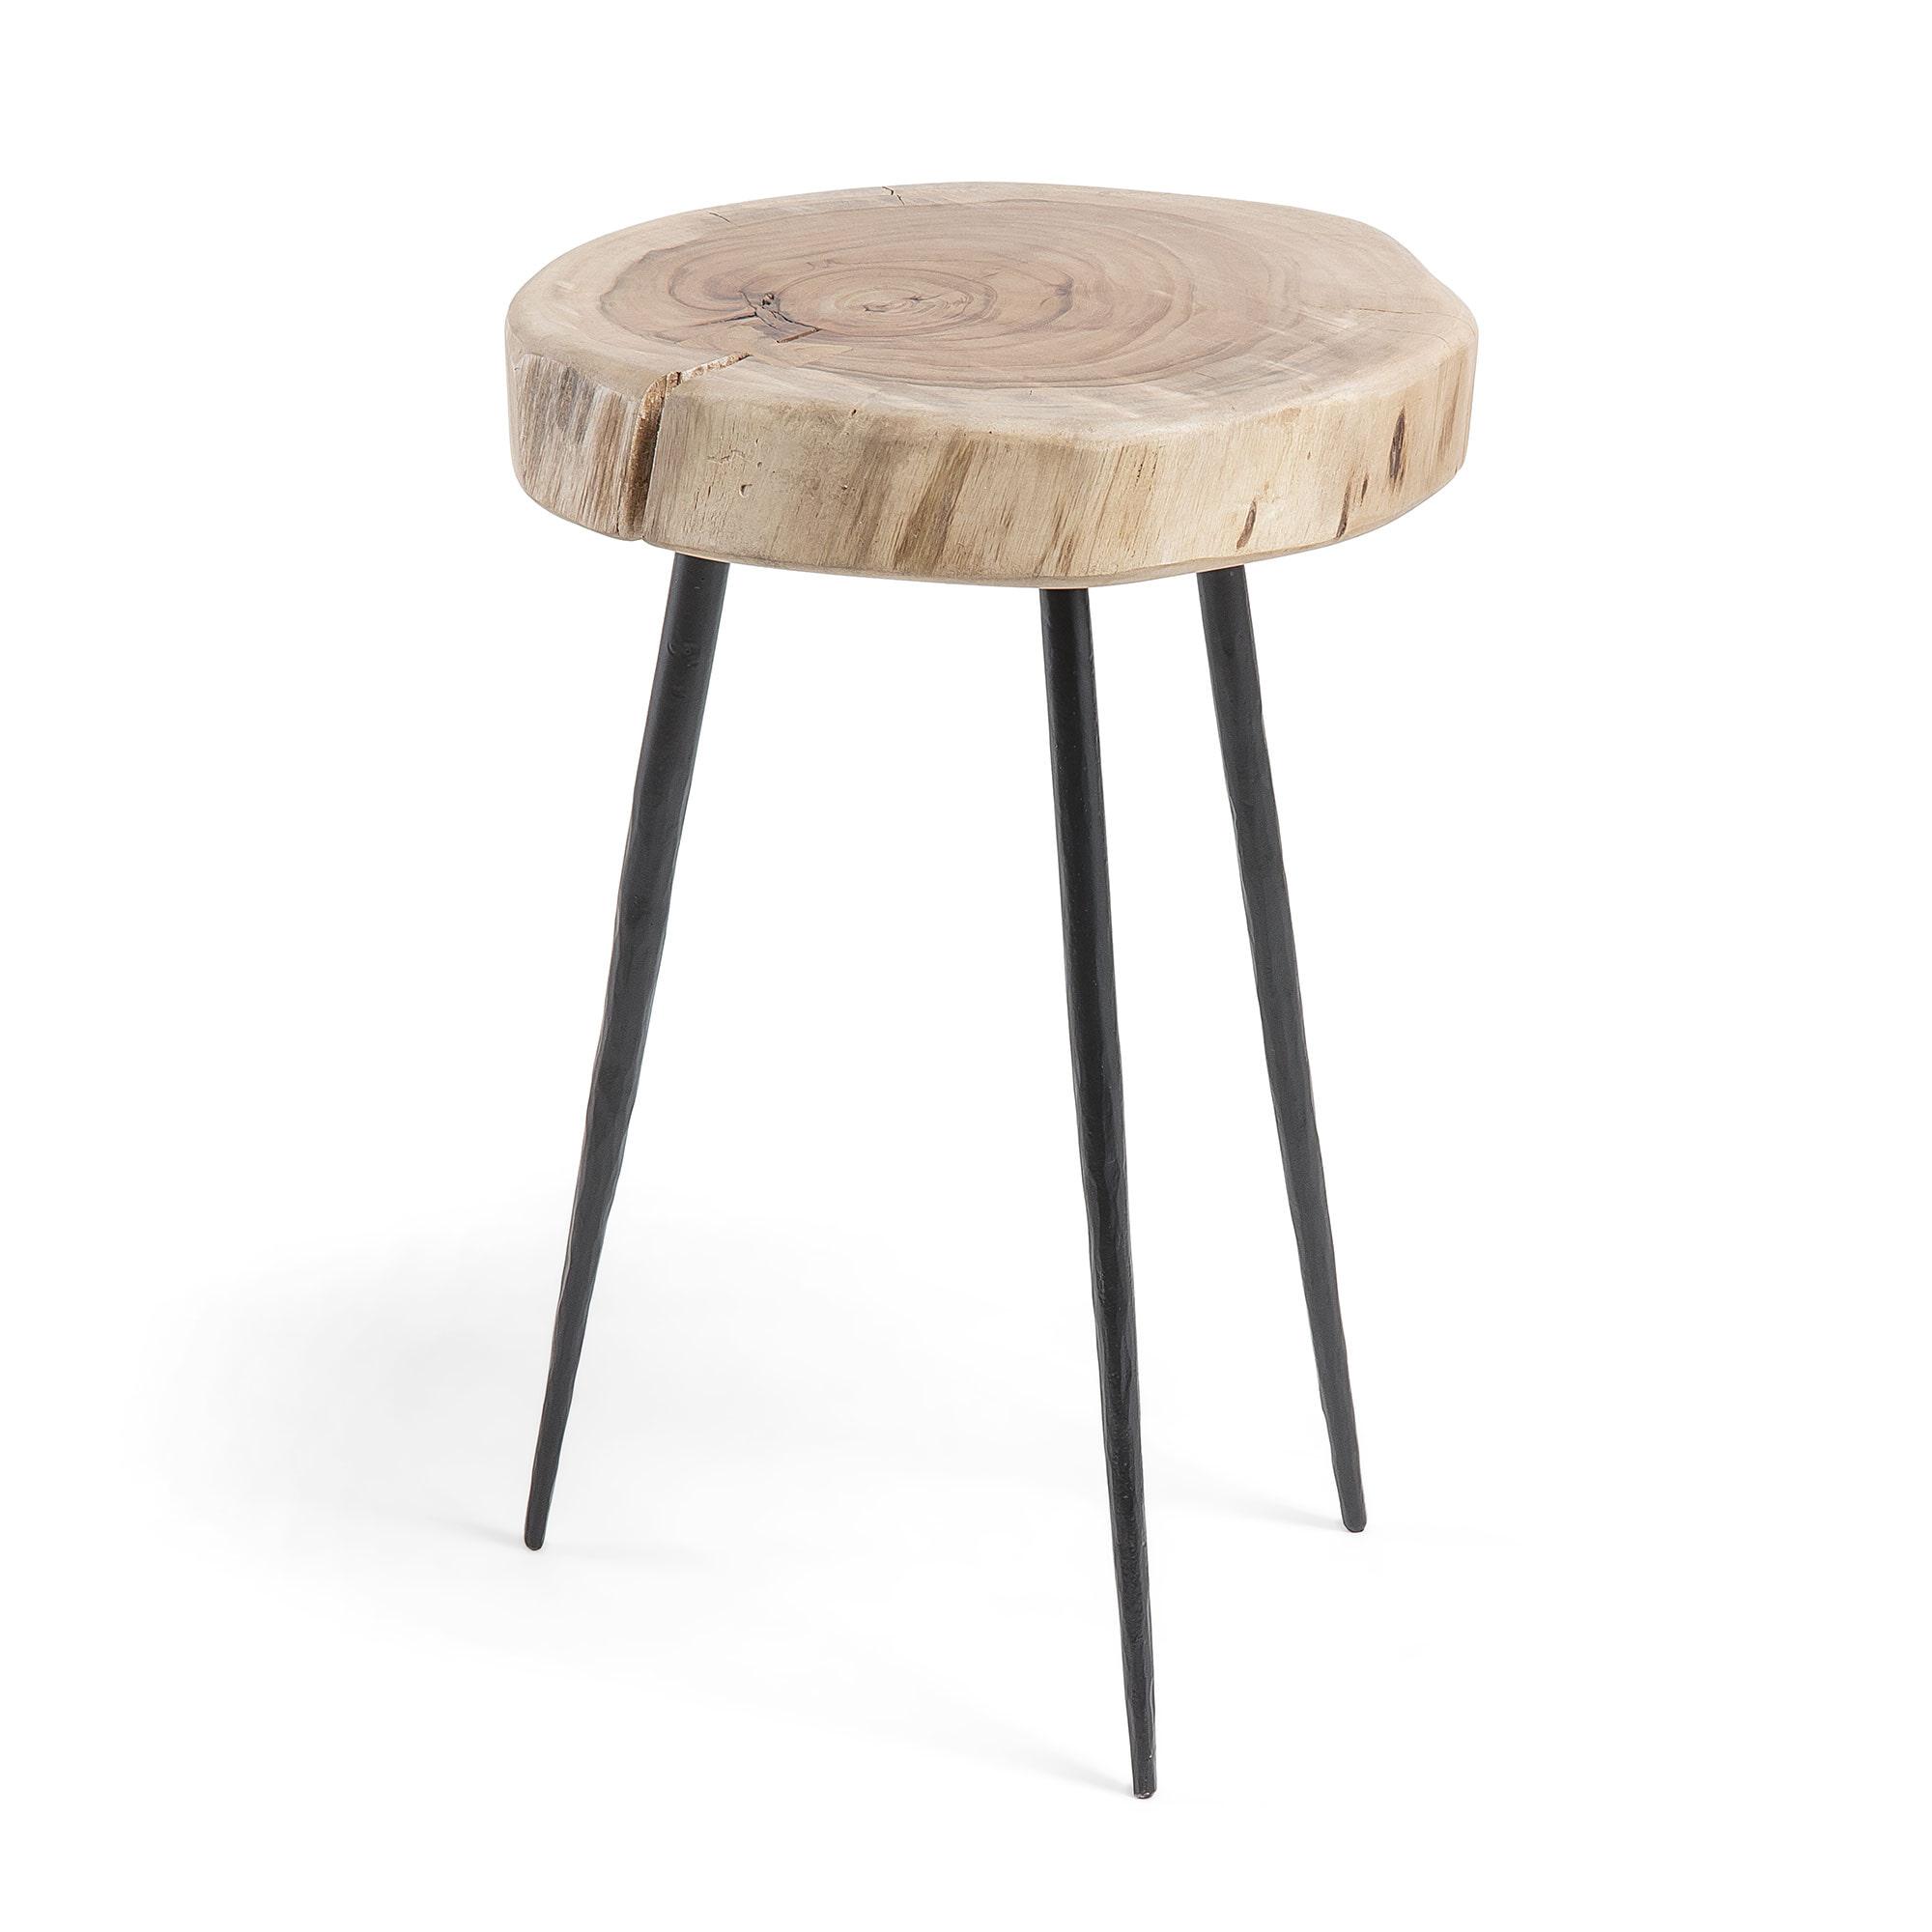 Uw partner in meubels: Kave Home Bijzettafel 'Eider' 54cm hoog Tafels | Bijzettafels